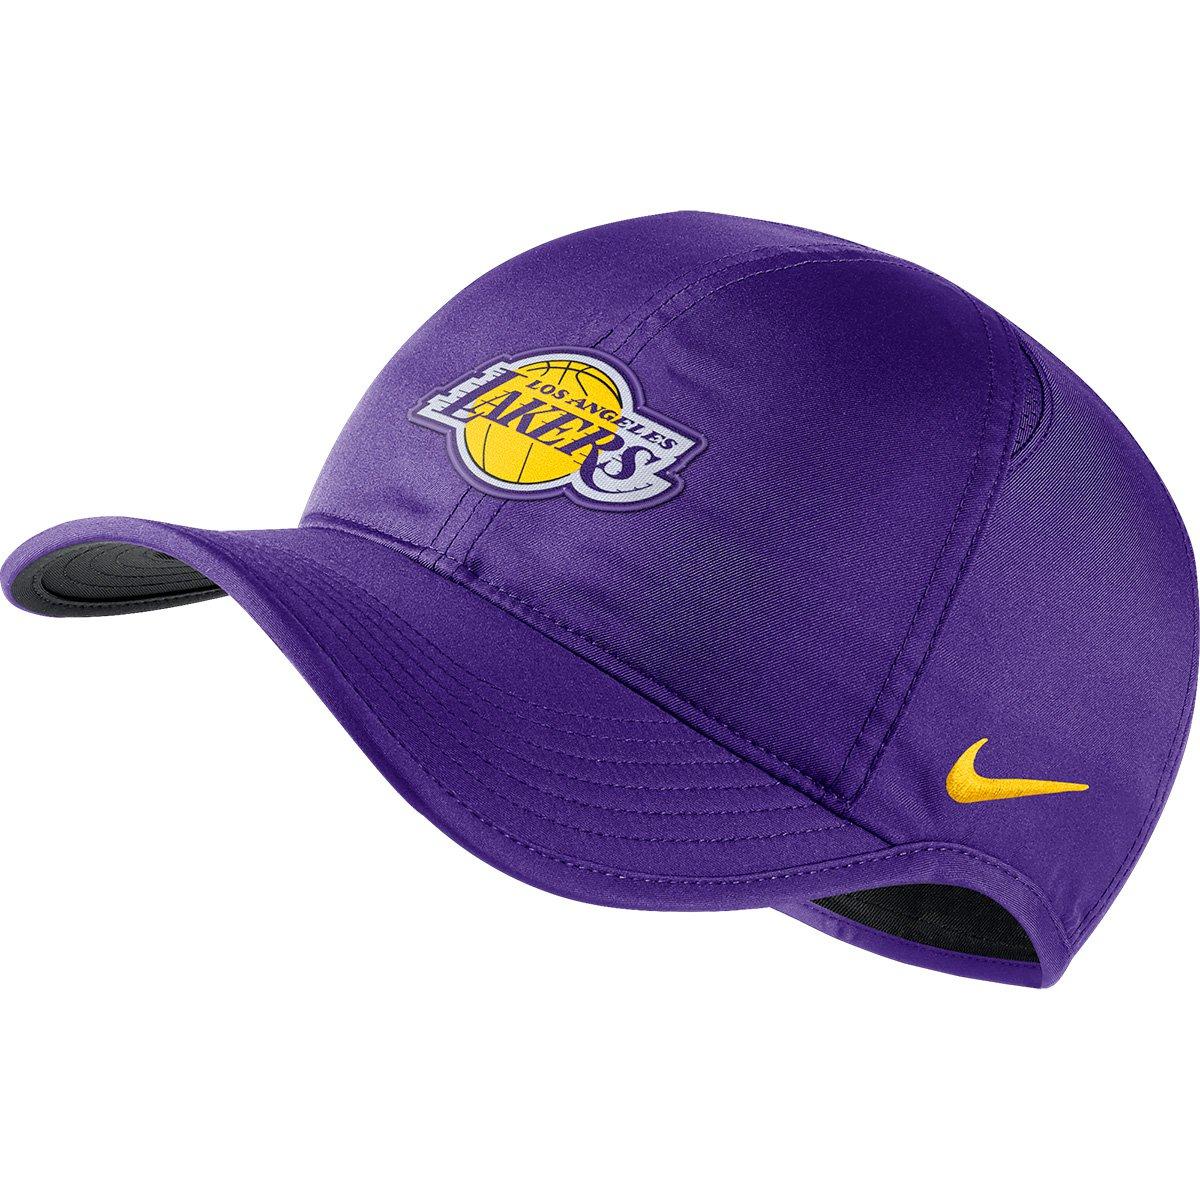 829ab47eb5e35 Boné Nike NBA Los Angeles Lakers Aba Curva Featherlight | Loja NBA